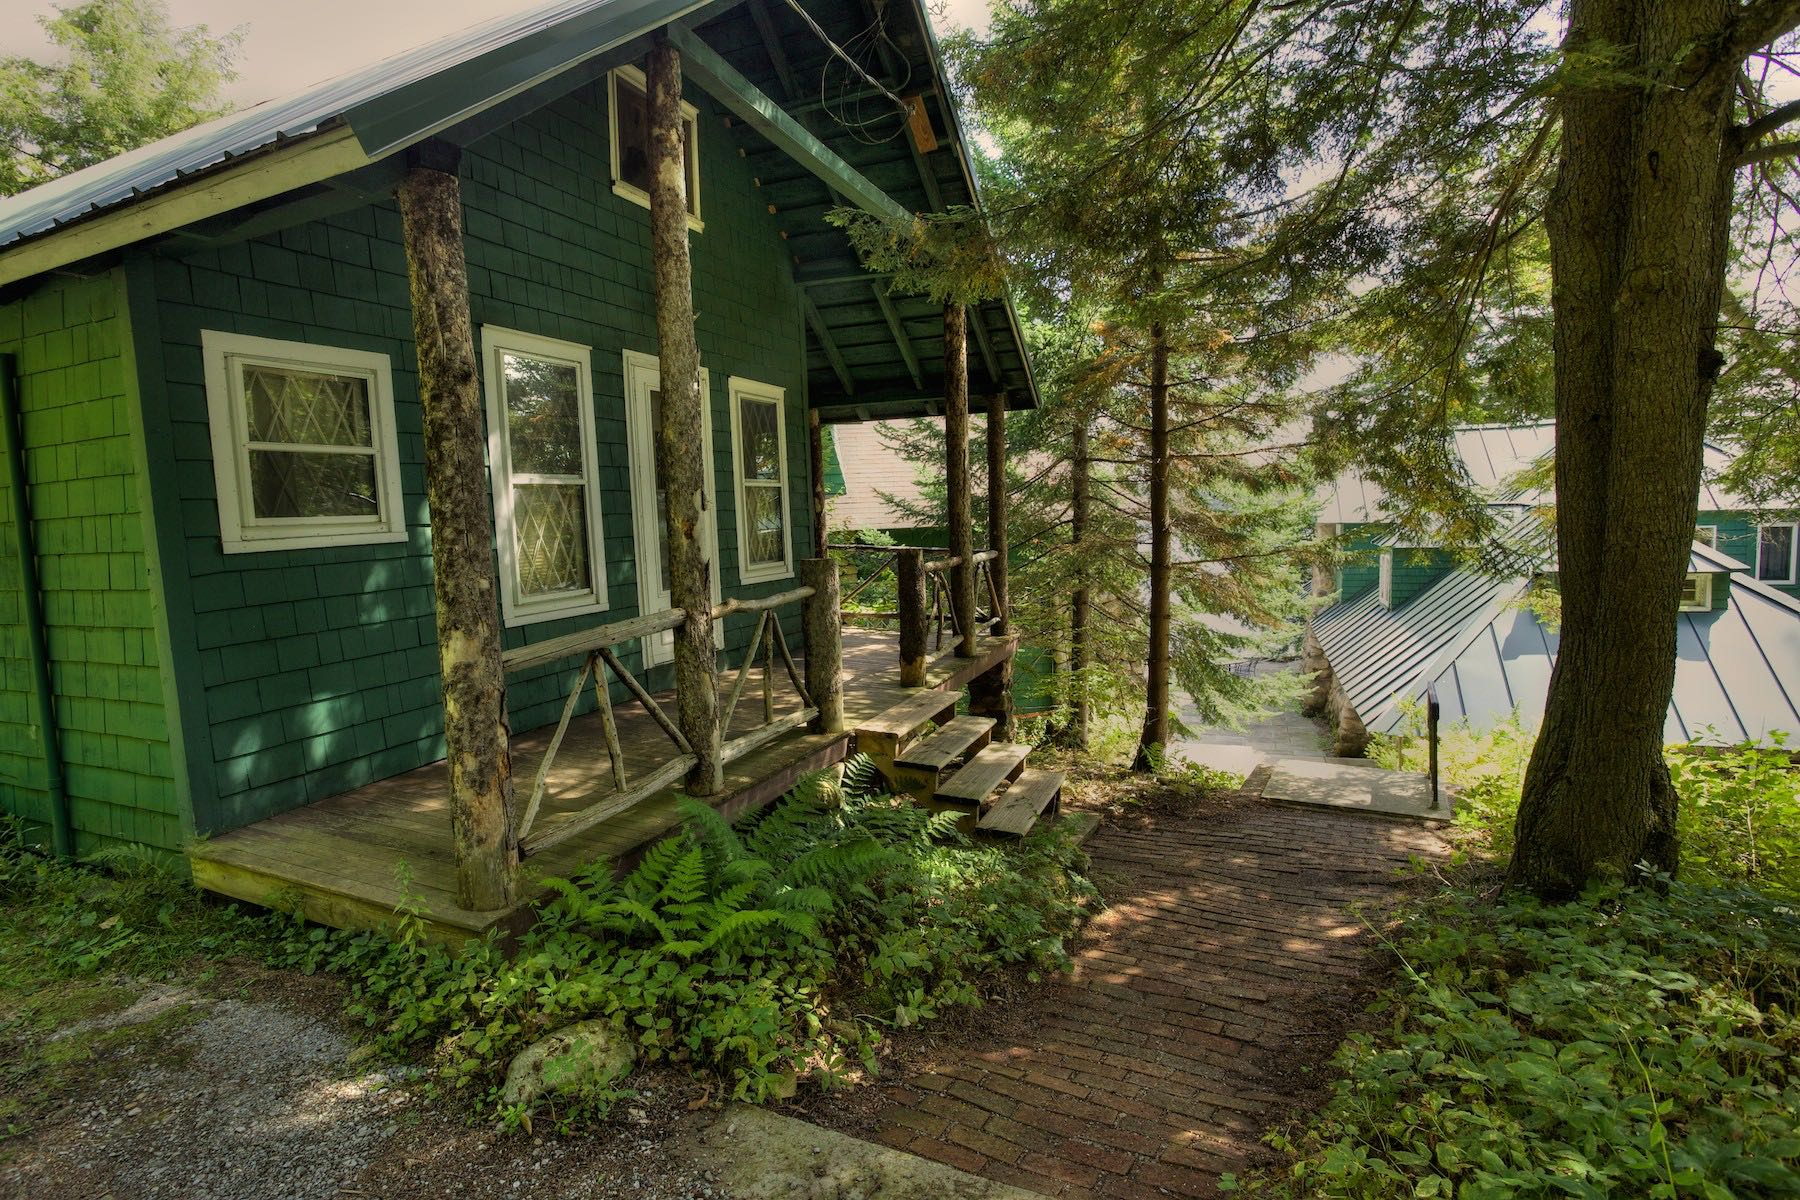 cabins adirondack prices rentals zook cabin adirondacks log